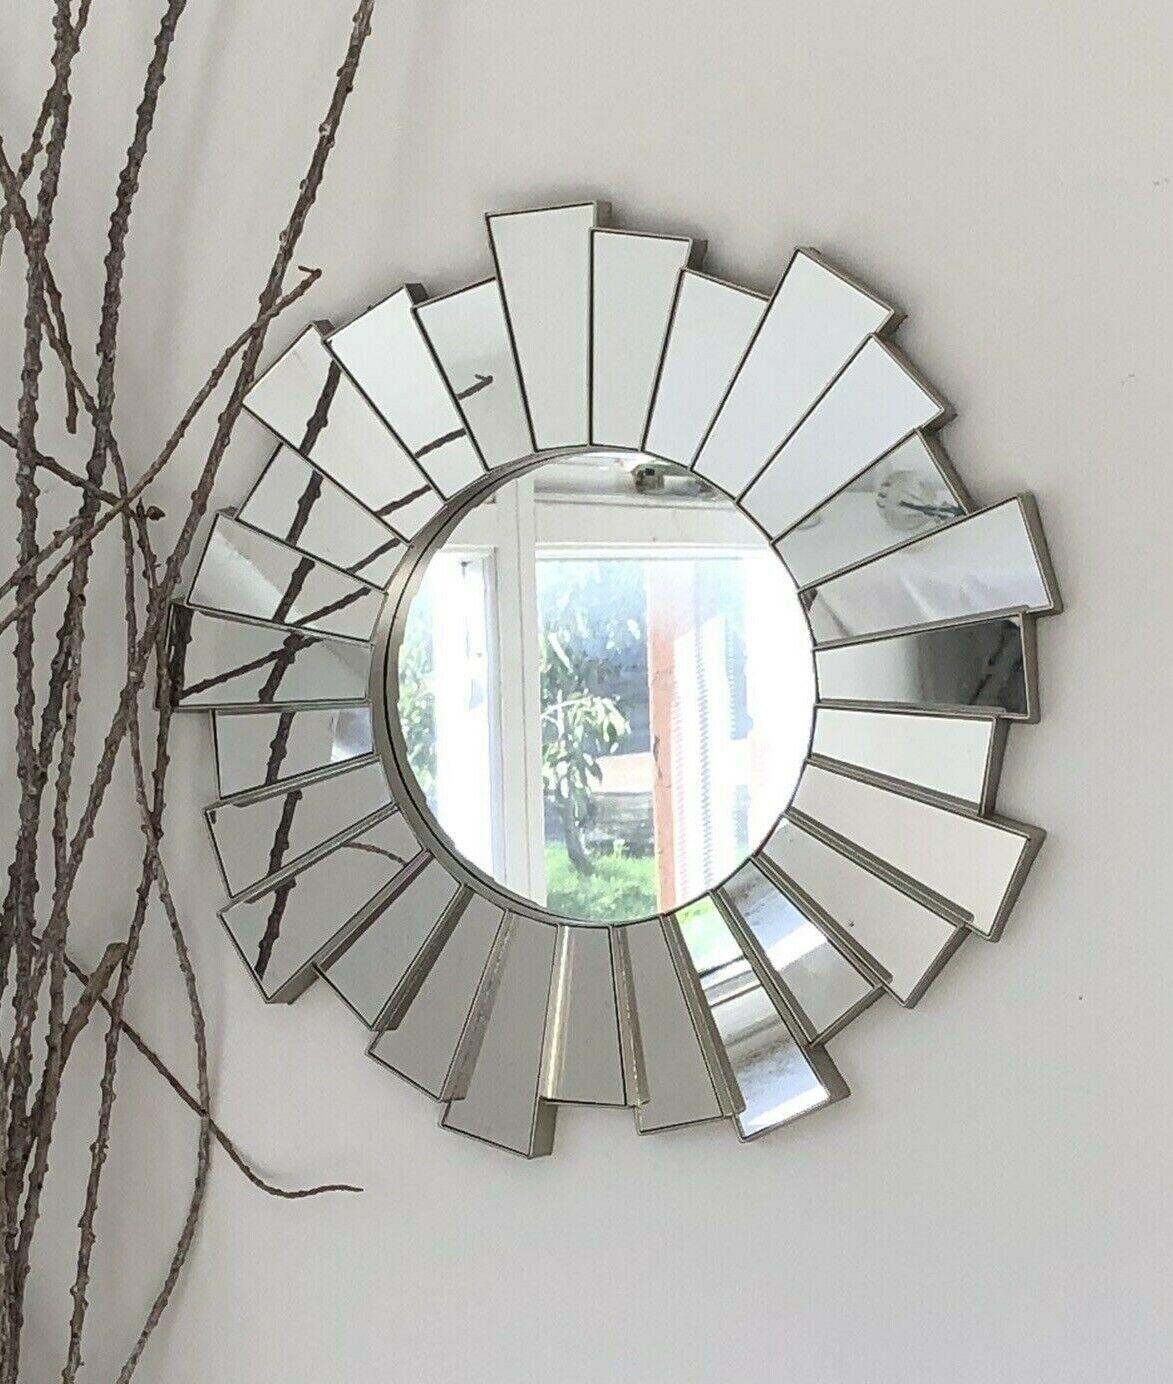 mirror - Silver Sunburst Ornate Art Deco Round Wall Mirror Decorative Vintage Style